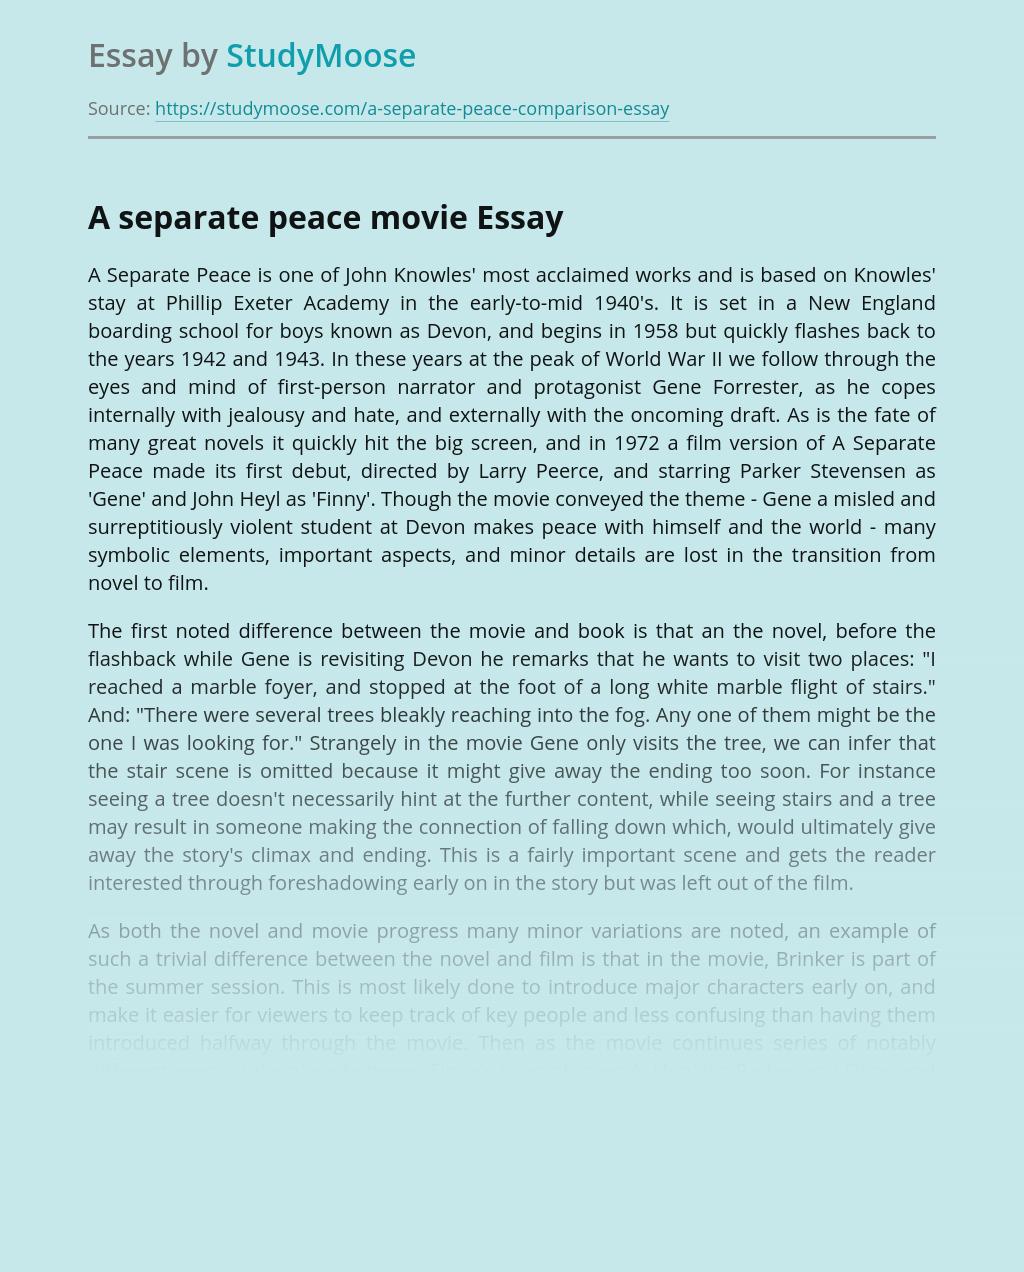 A separate peace movie